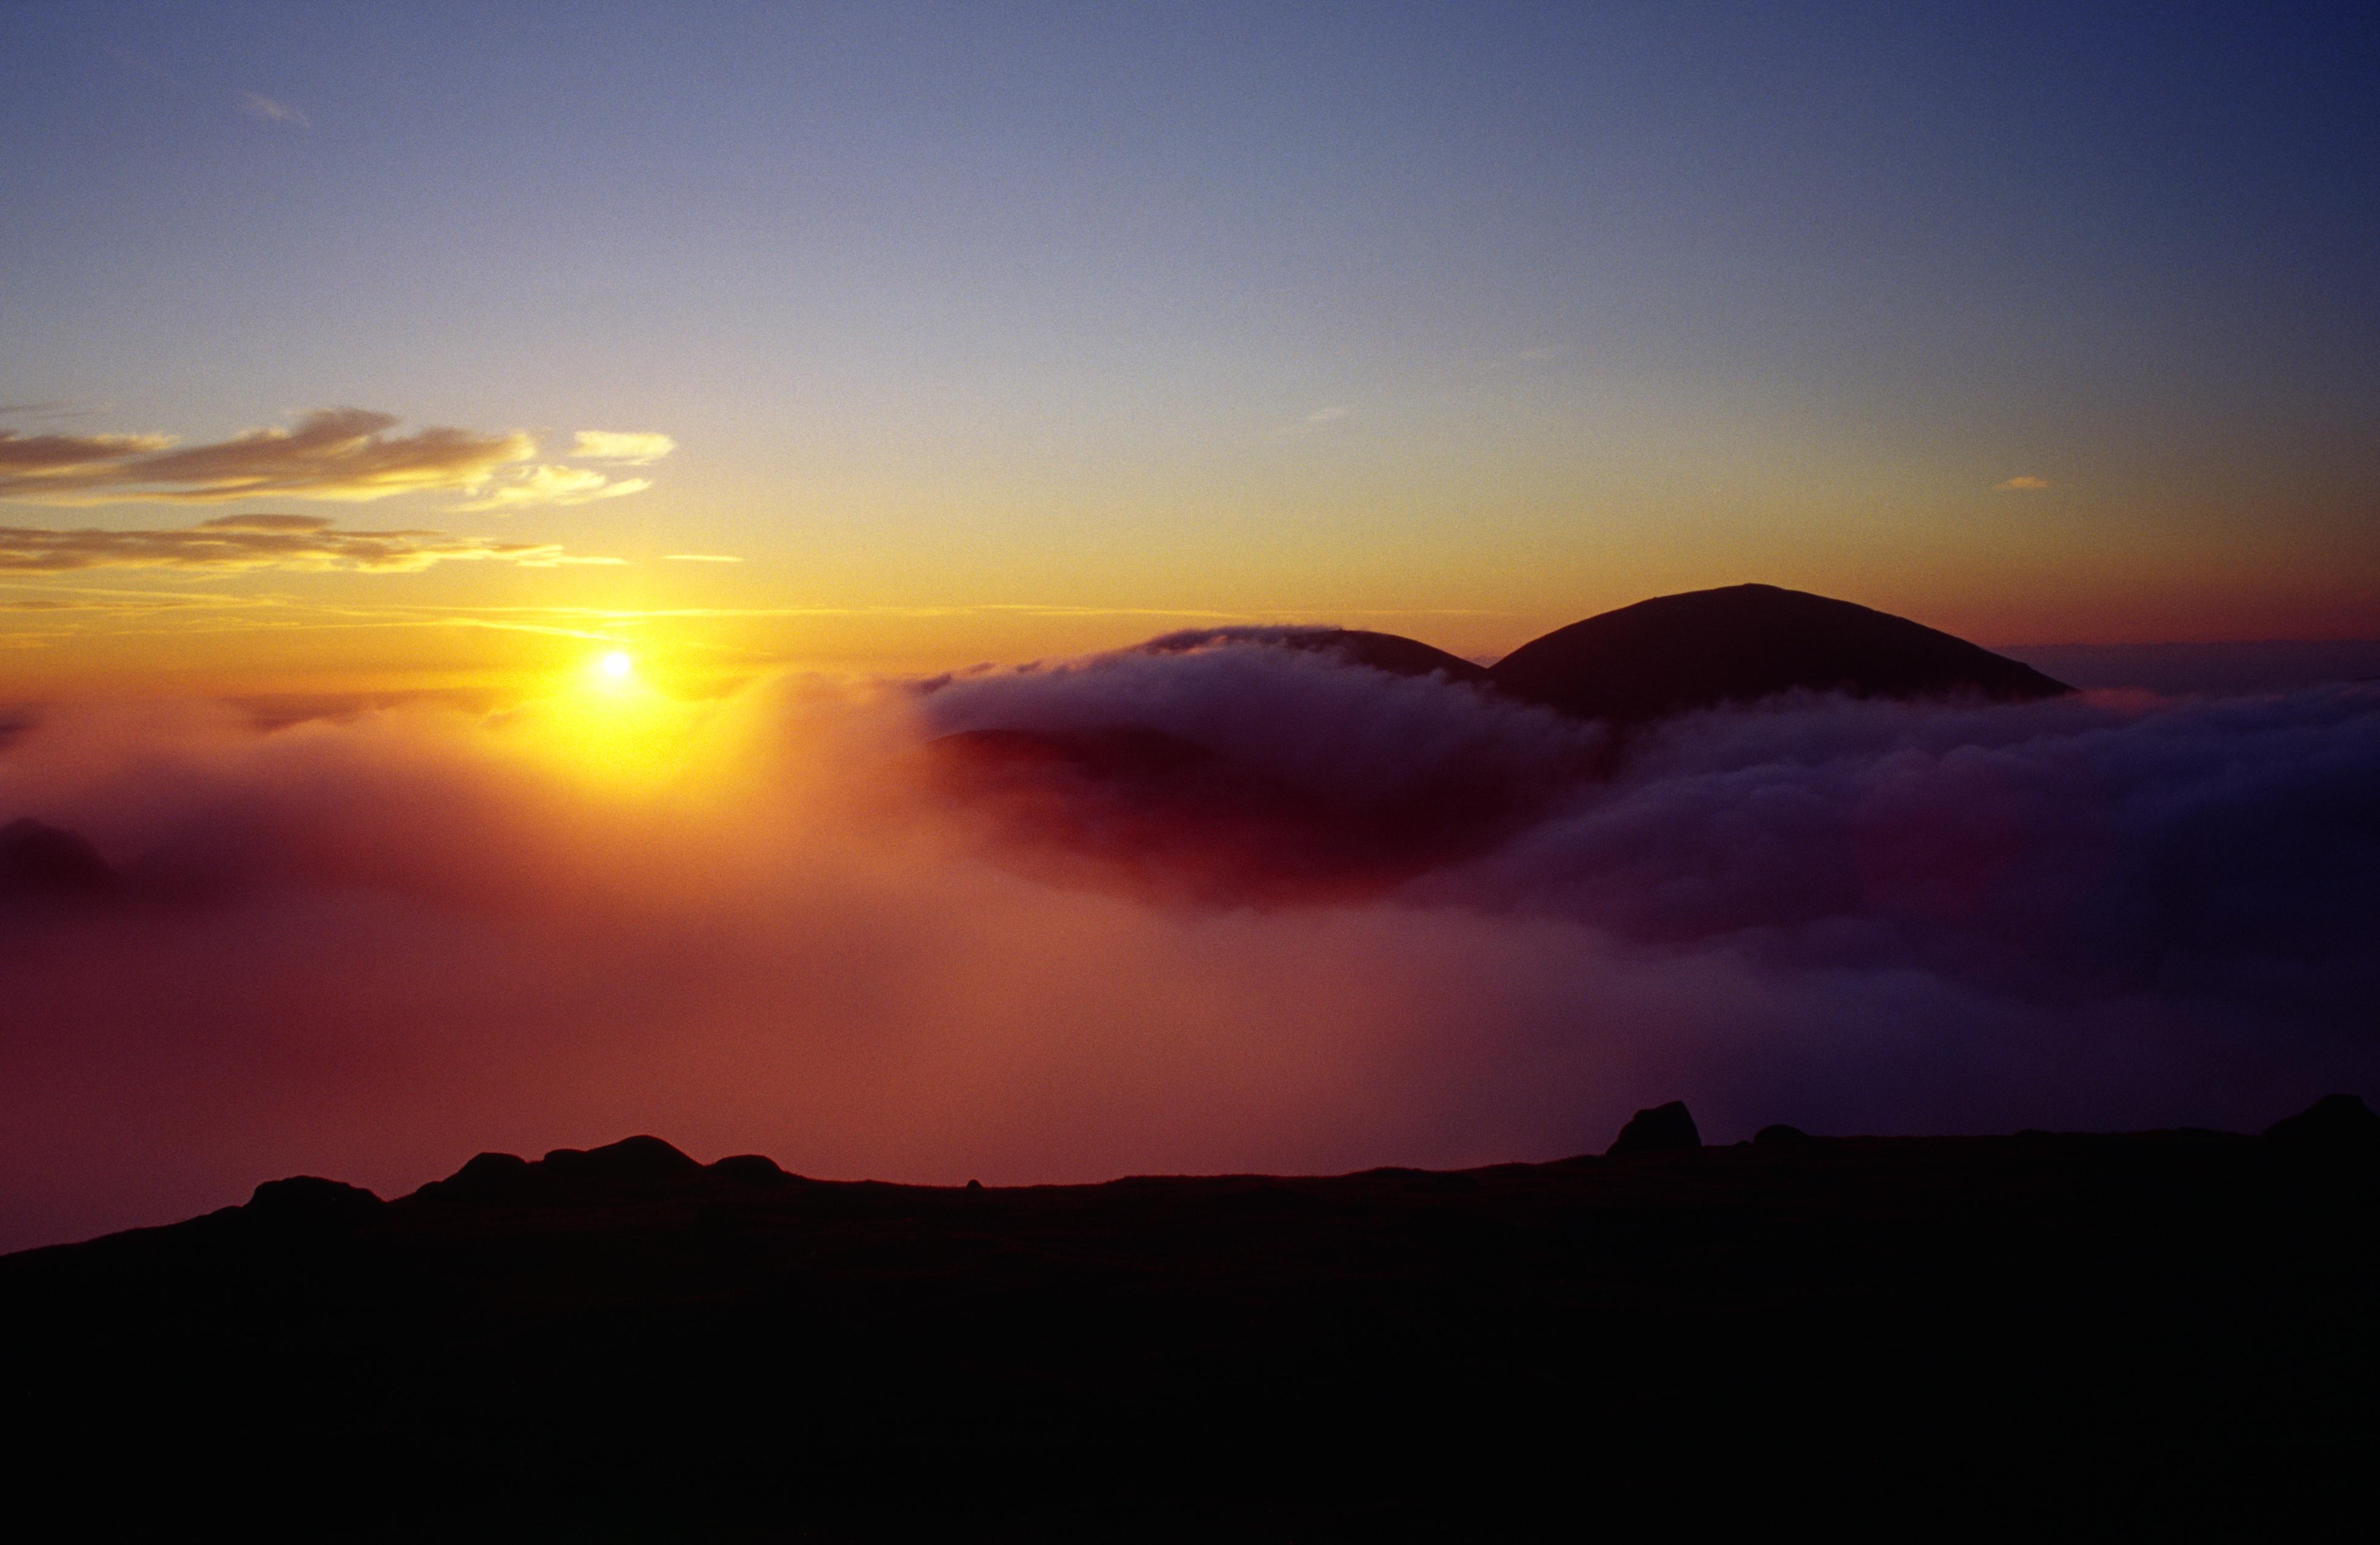 Slieve Donard & Cloud Inversion at Sunrise